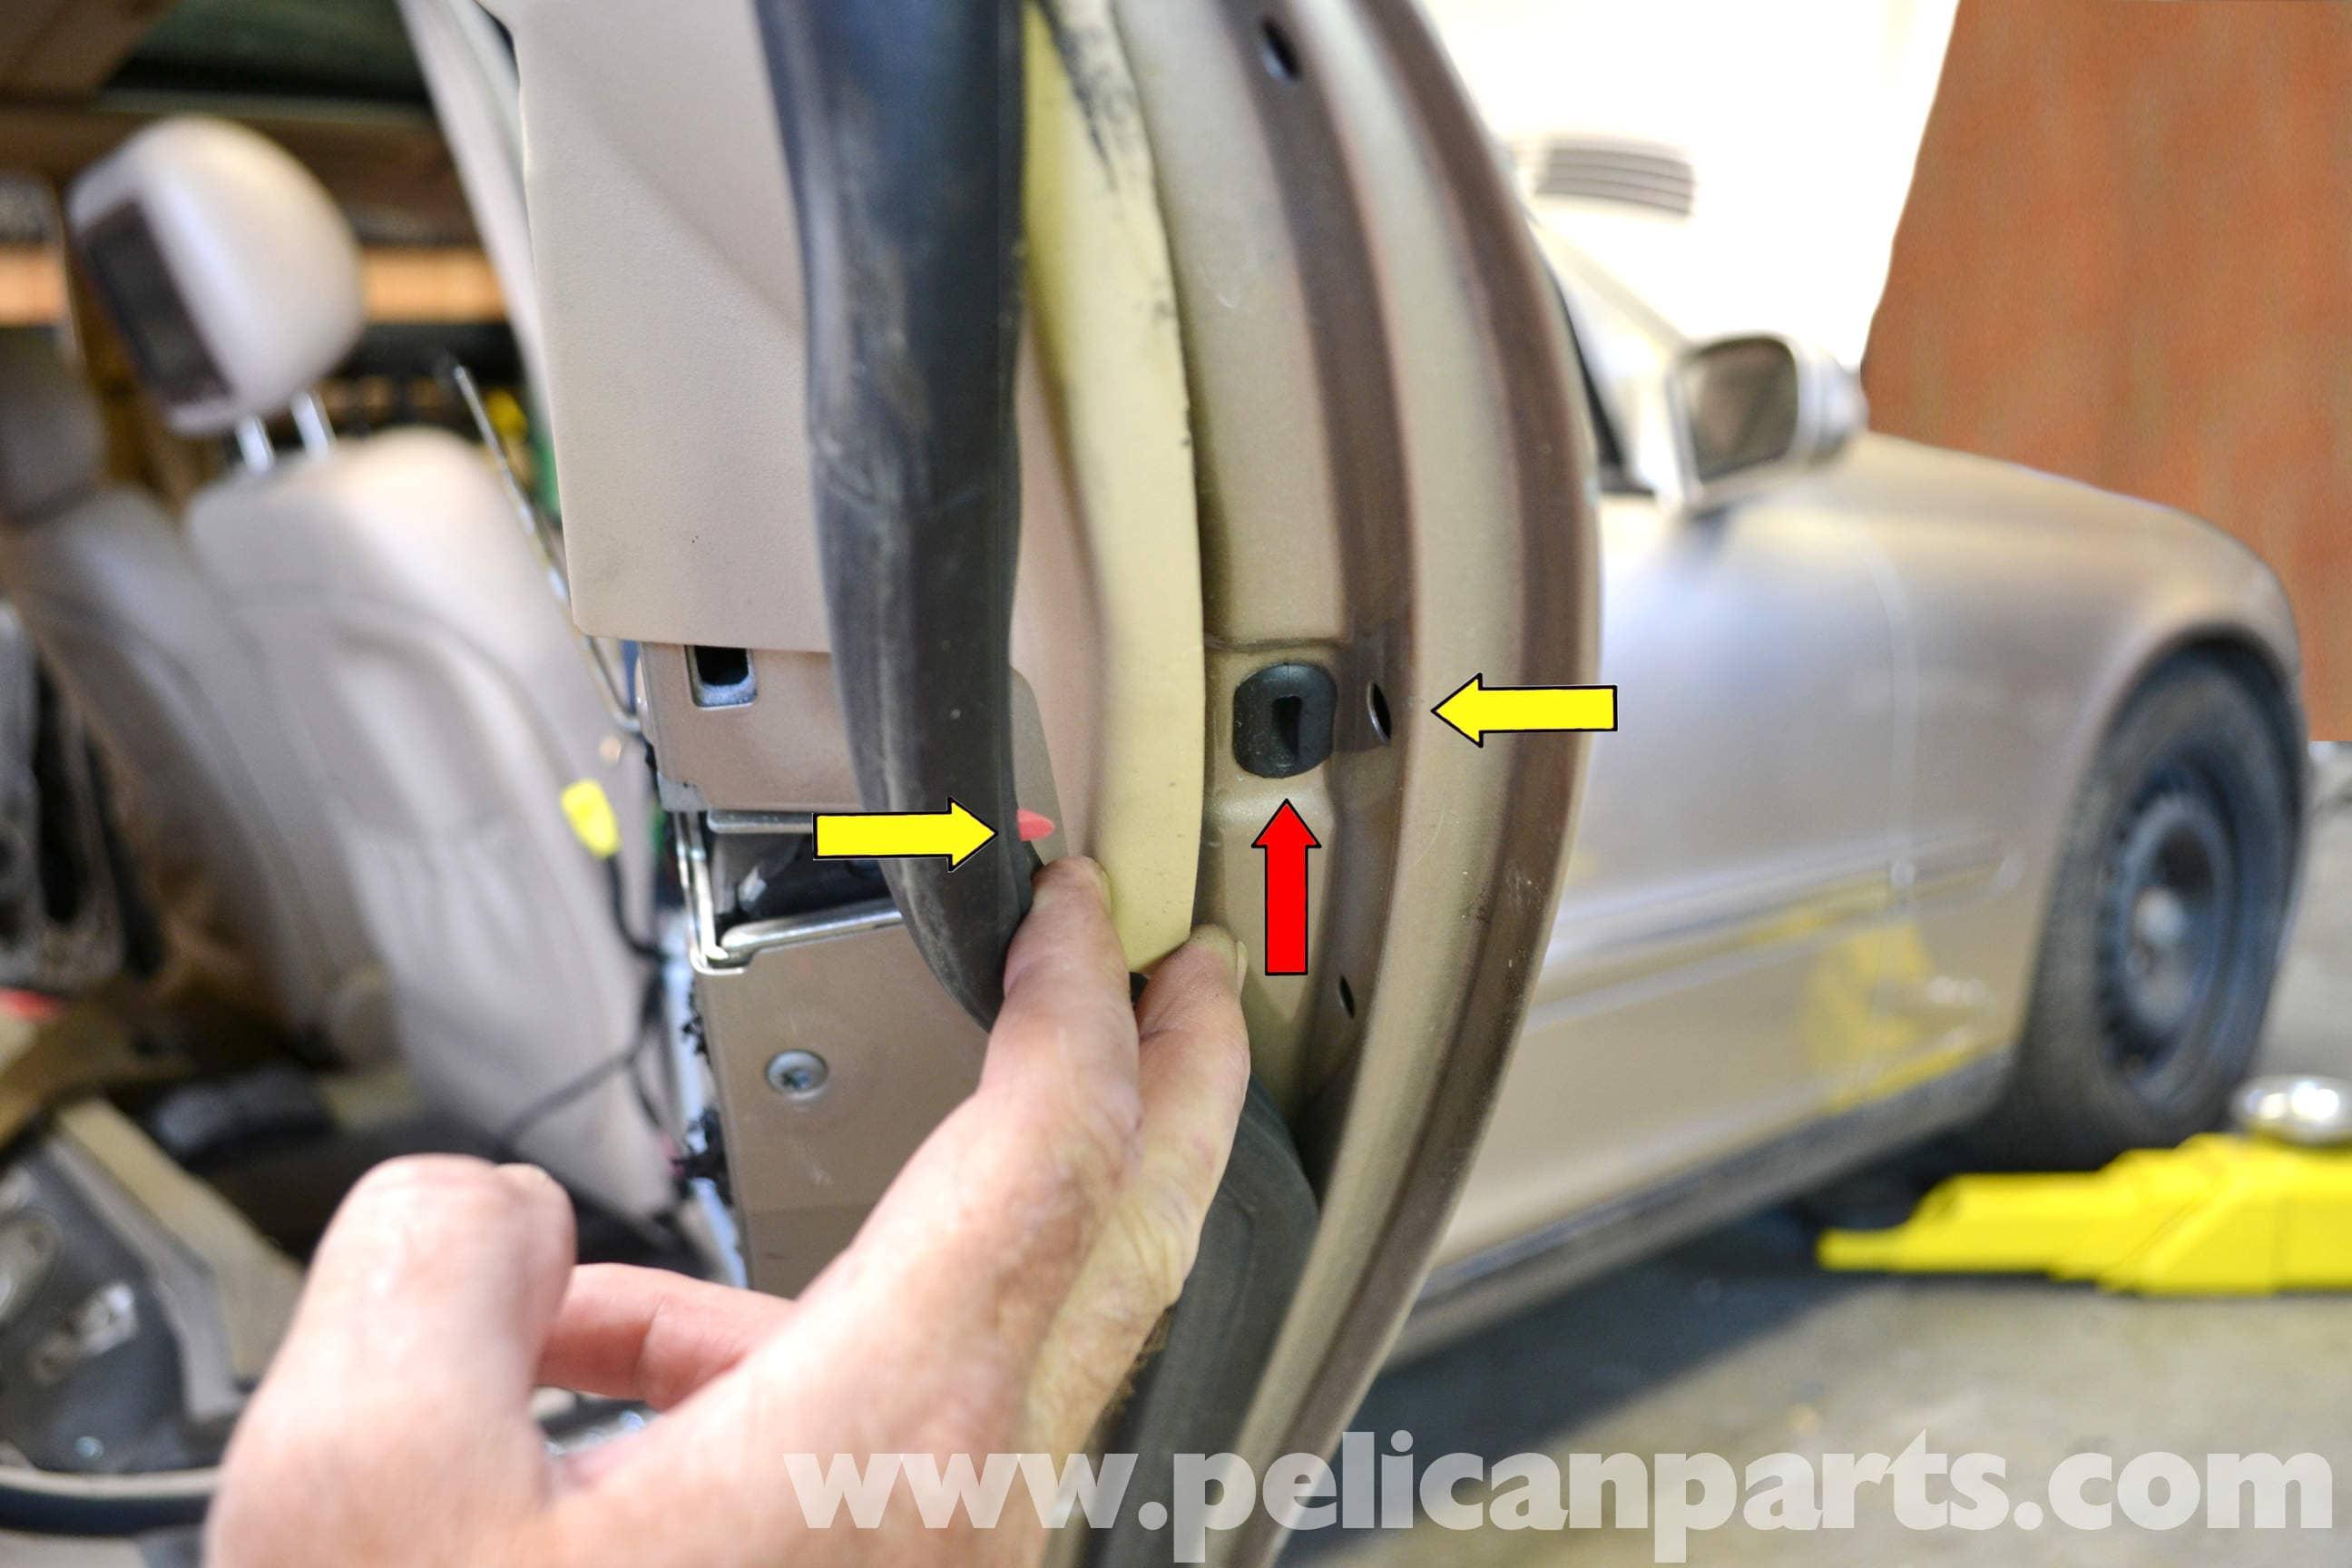 Mercedes Benz W203 Rear Door Handle Removal 2001 2007